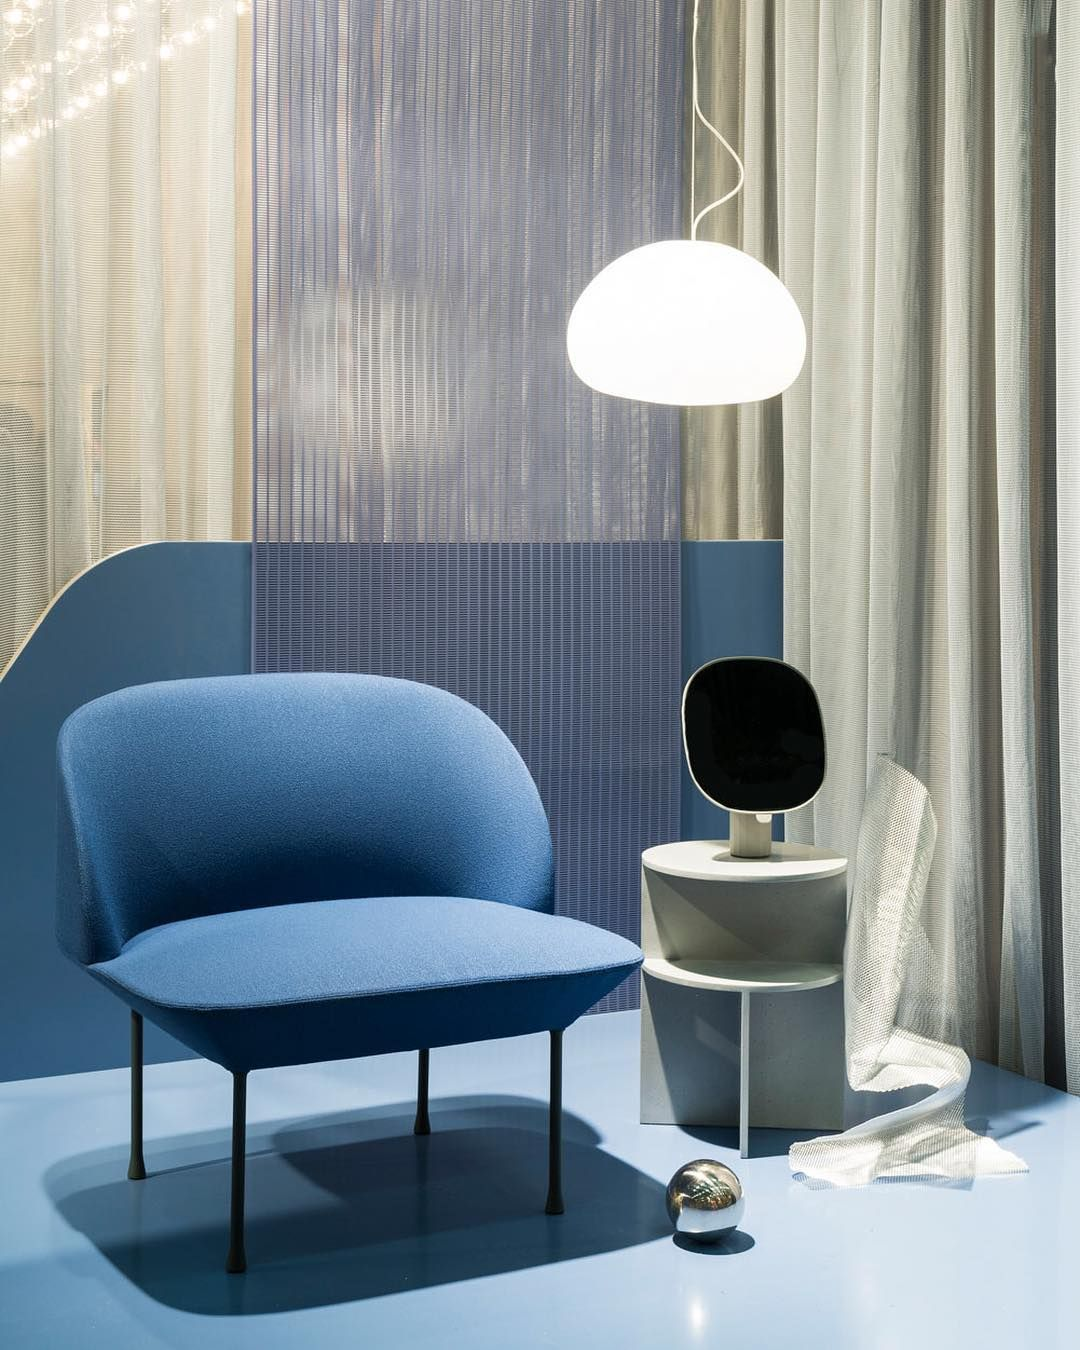 Fein Peachy Design Sofa Reiniger Zeitgenössisch - Heimat Ideen ...